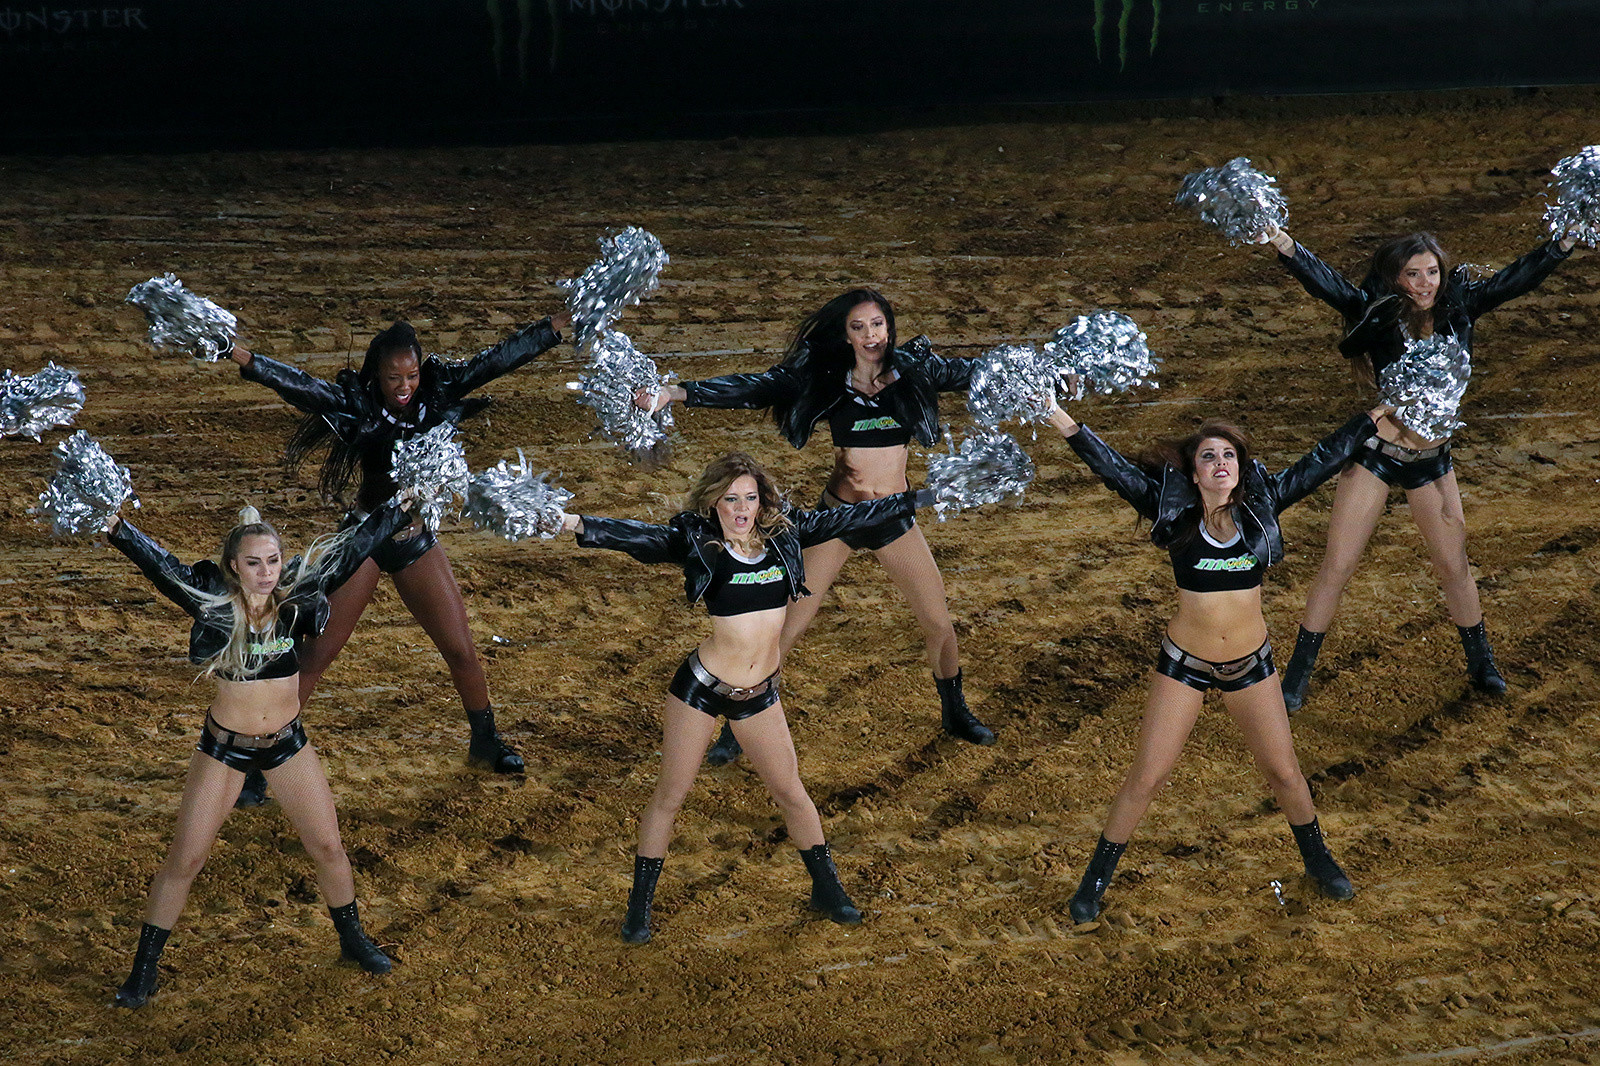 Oh-la-la. The pop-pom dancers are a staple of the action at the Paris Supercross.